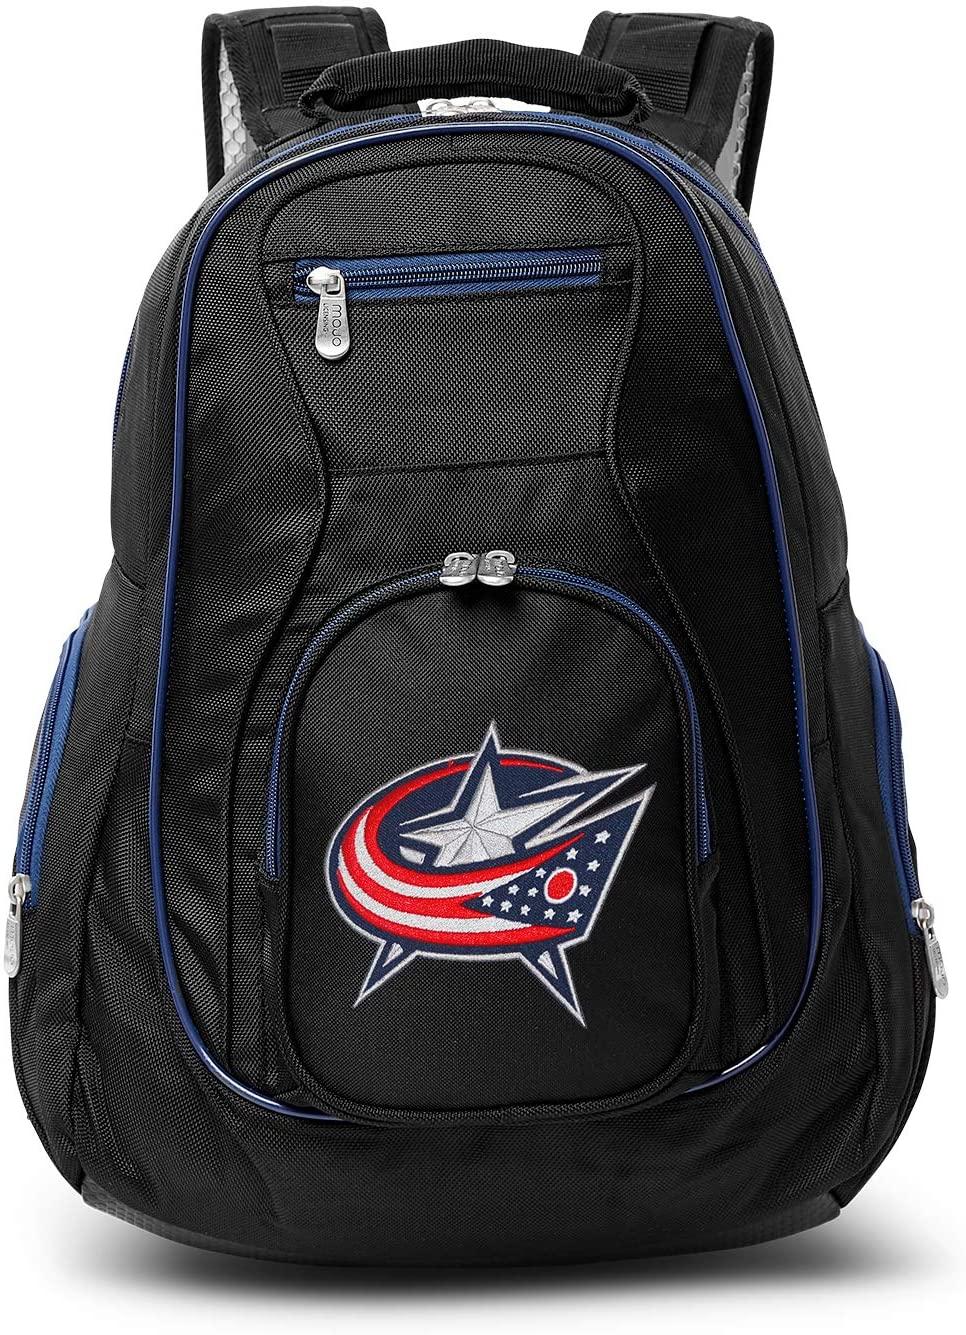 Denco NHL Colored Trim Premium Laptop Backpack, 19-inches